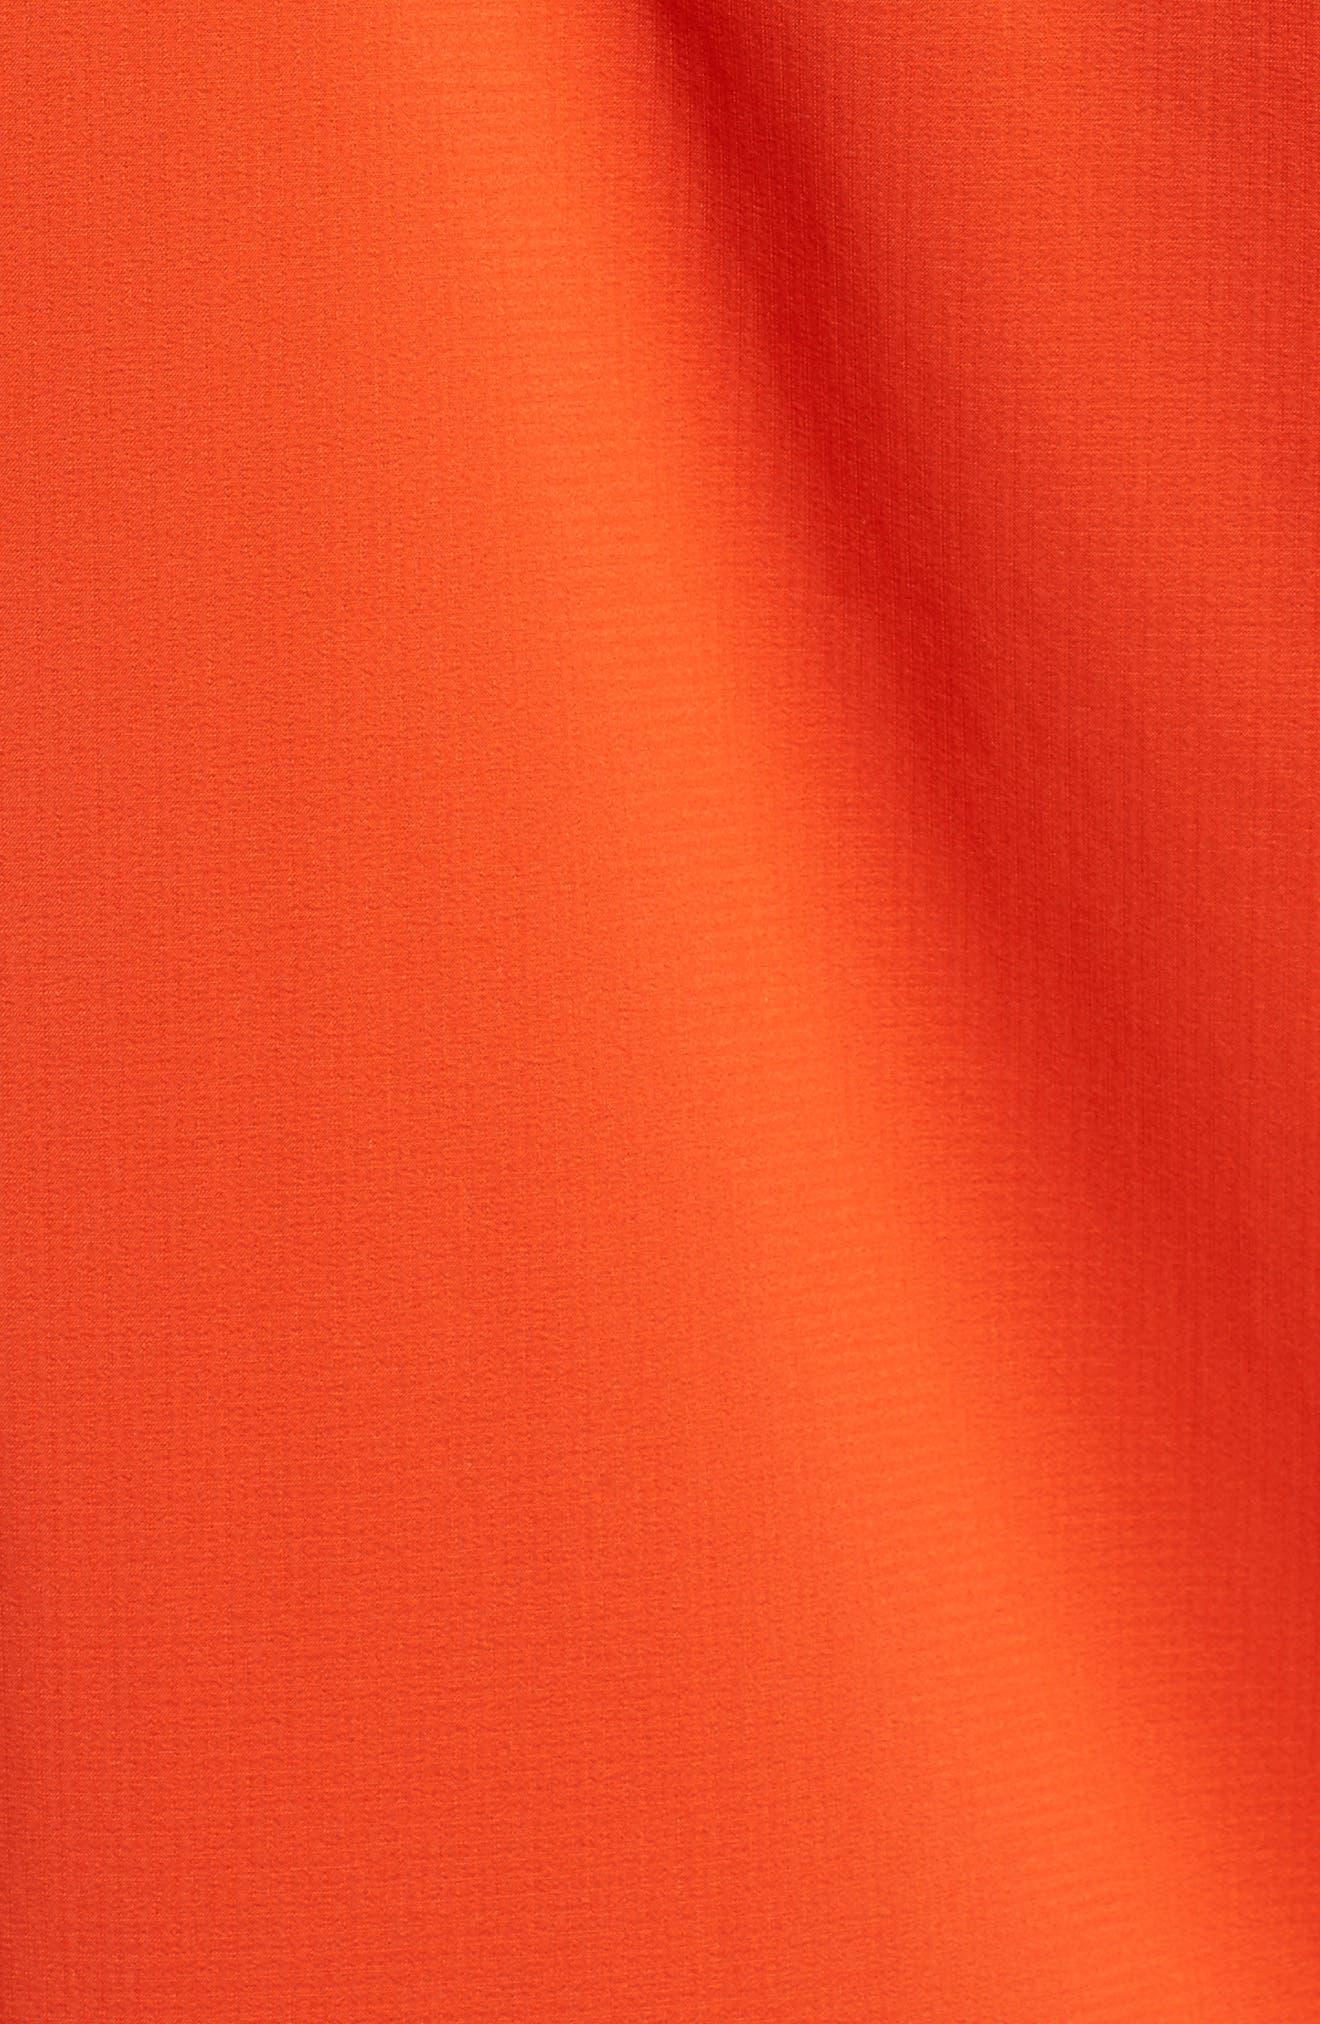 Stretch Rainshadow Jacket,                             Alternate thumbnail 5, color,                             Paintbrush Red